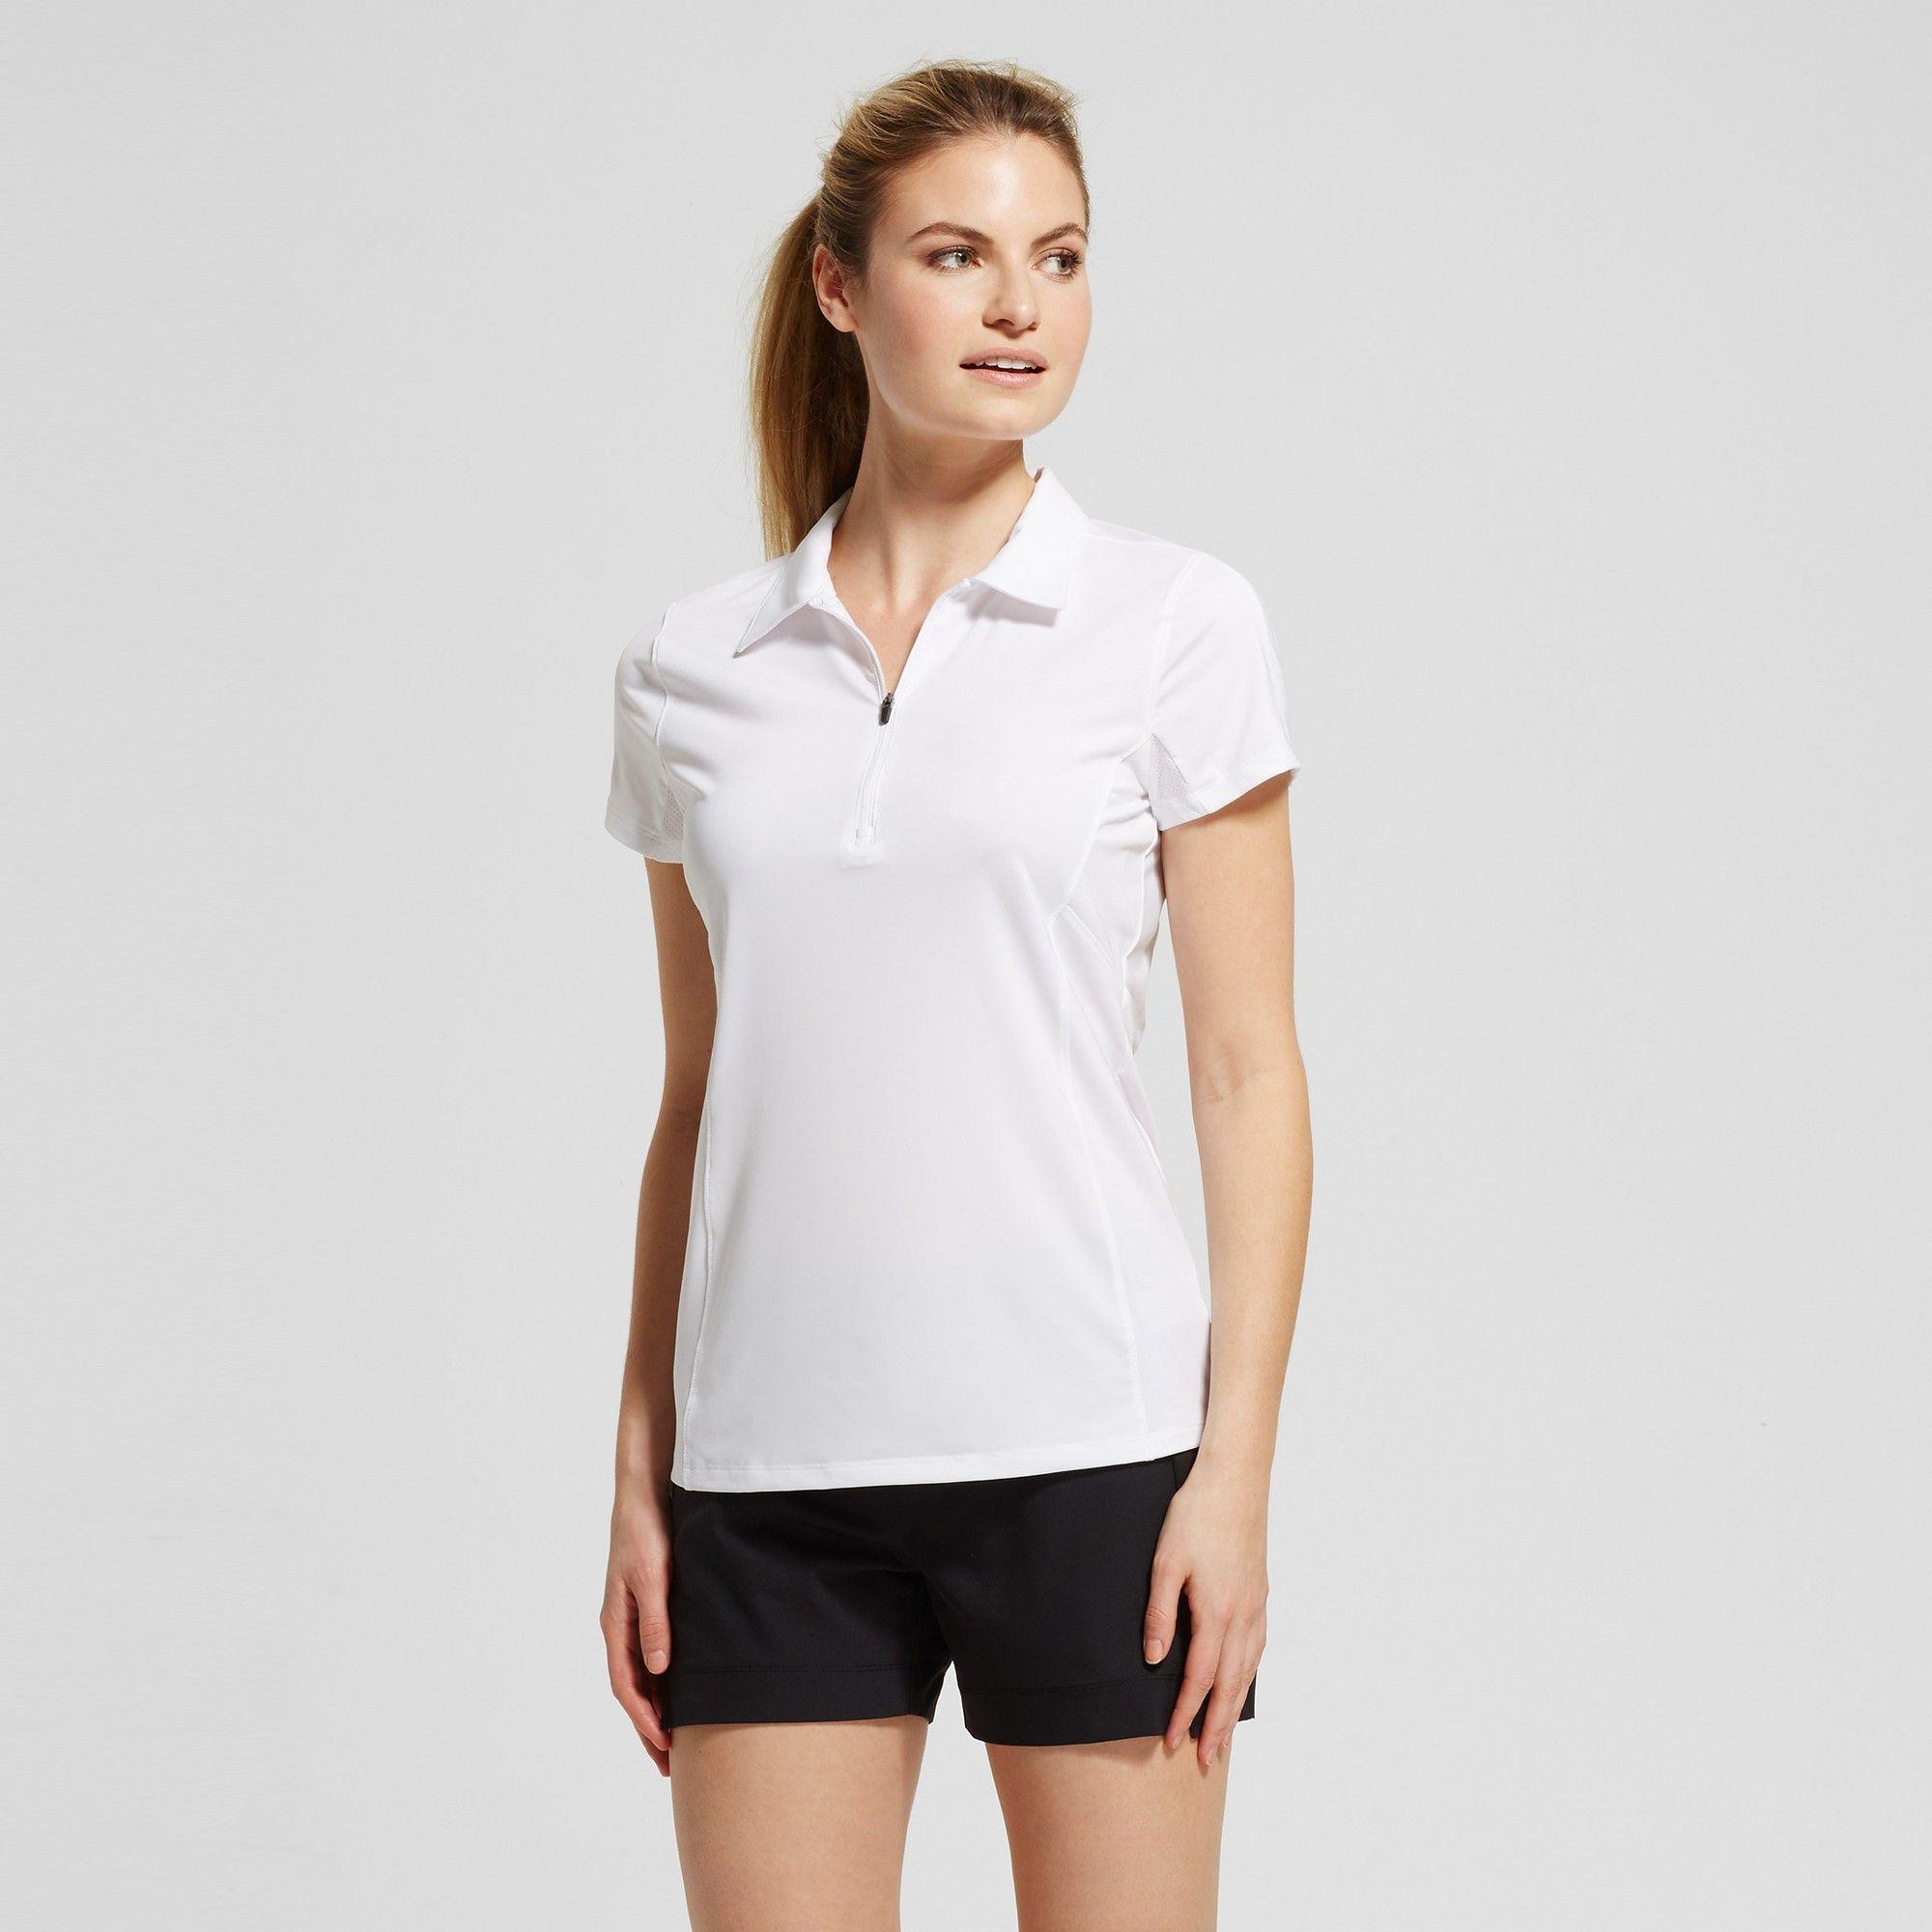 1170f872 Women's Zip Up Golf Polo Shirt - C9 Champion - White Xxl #GolfPolo ...